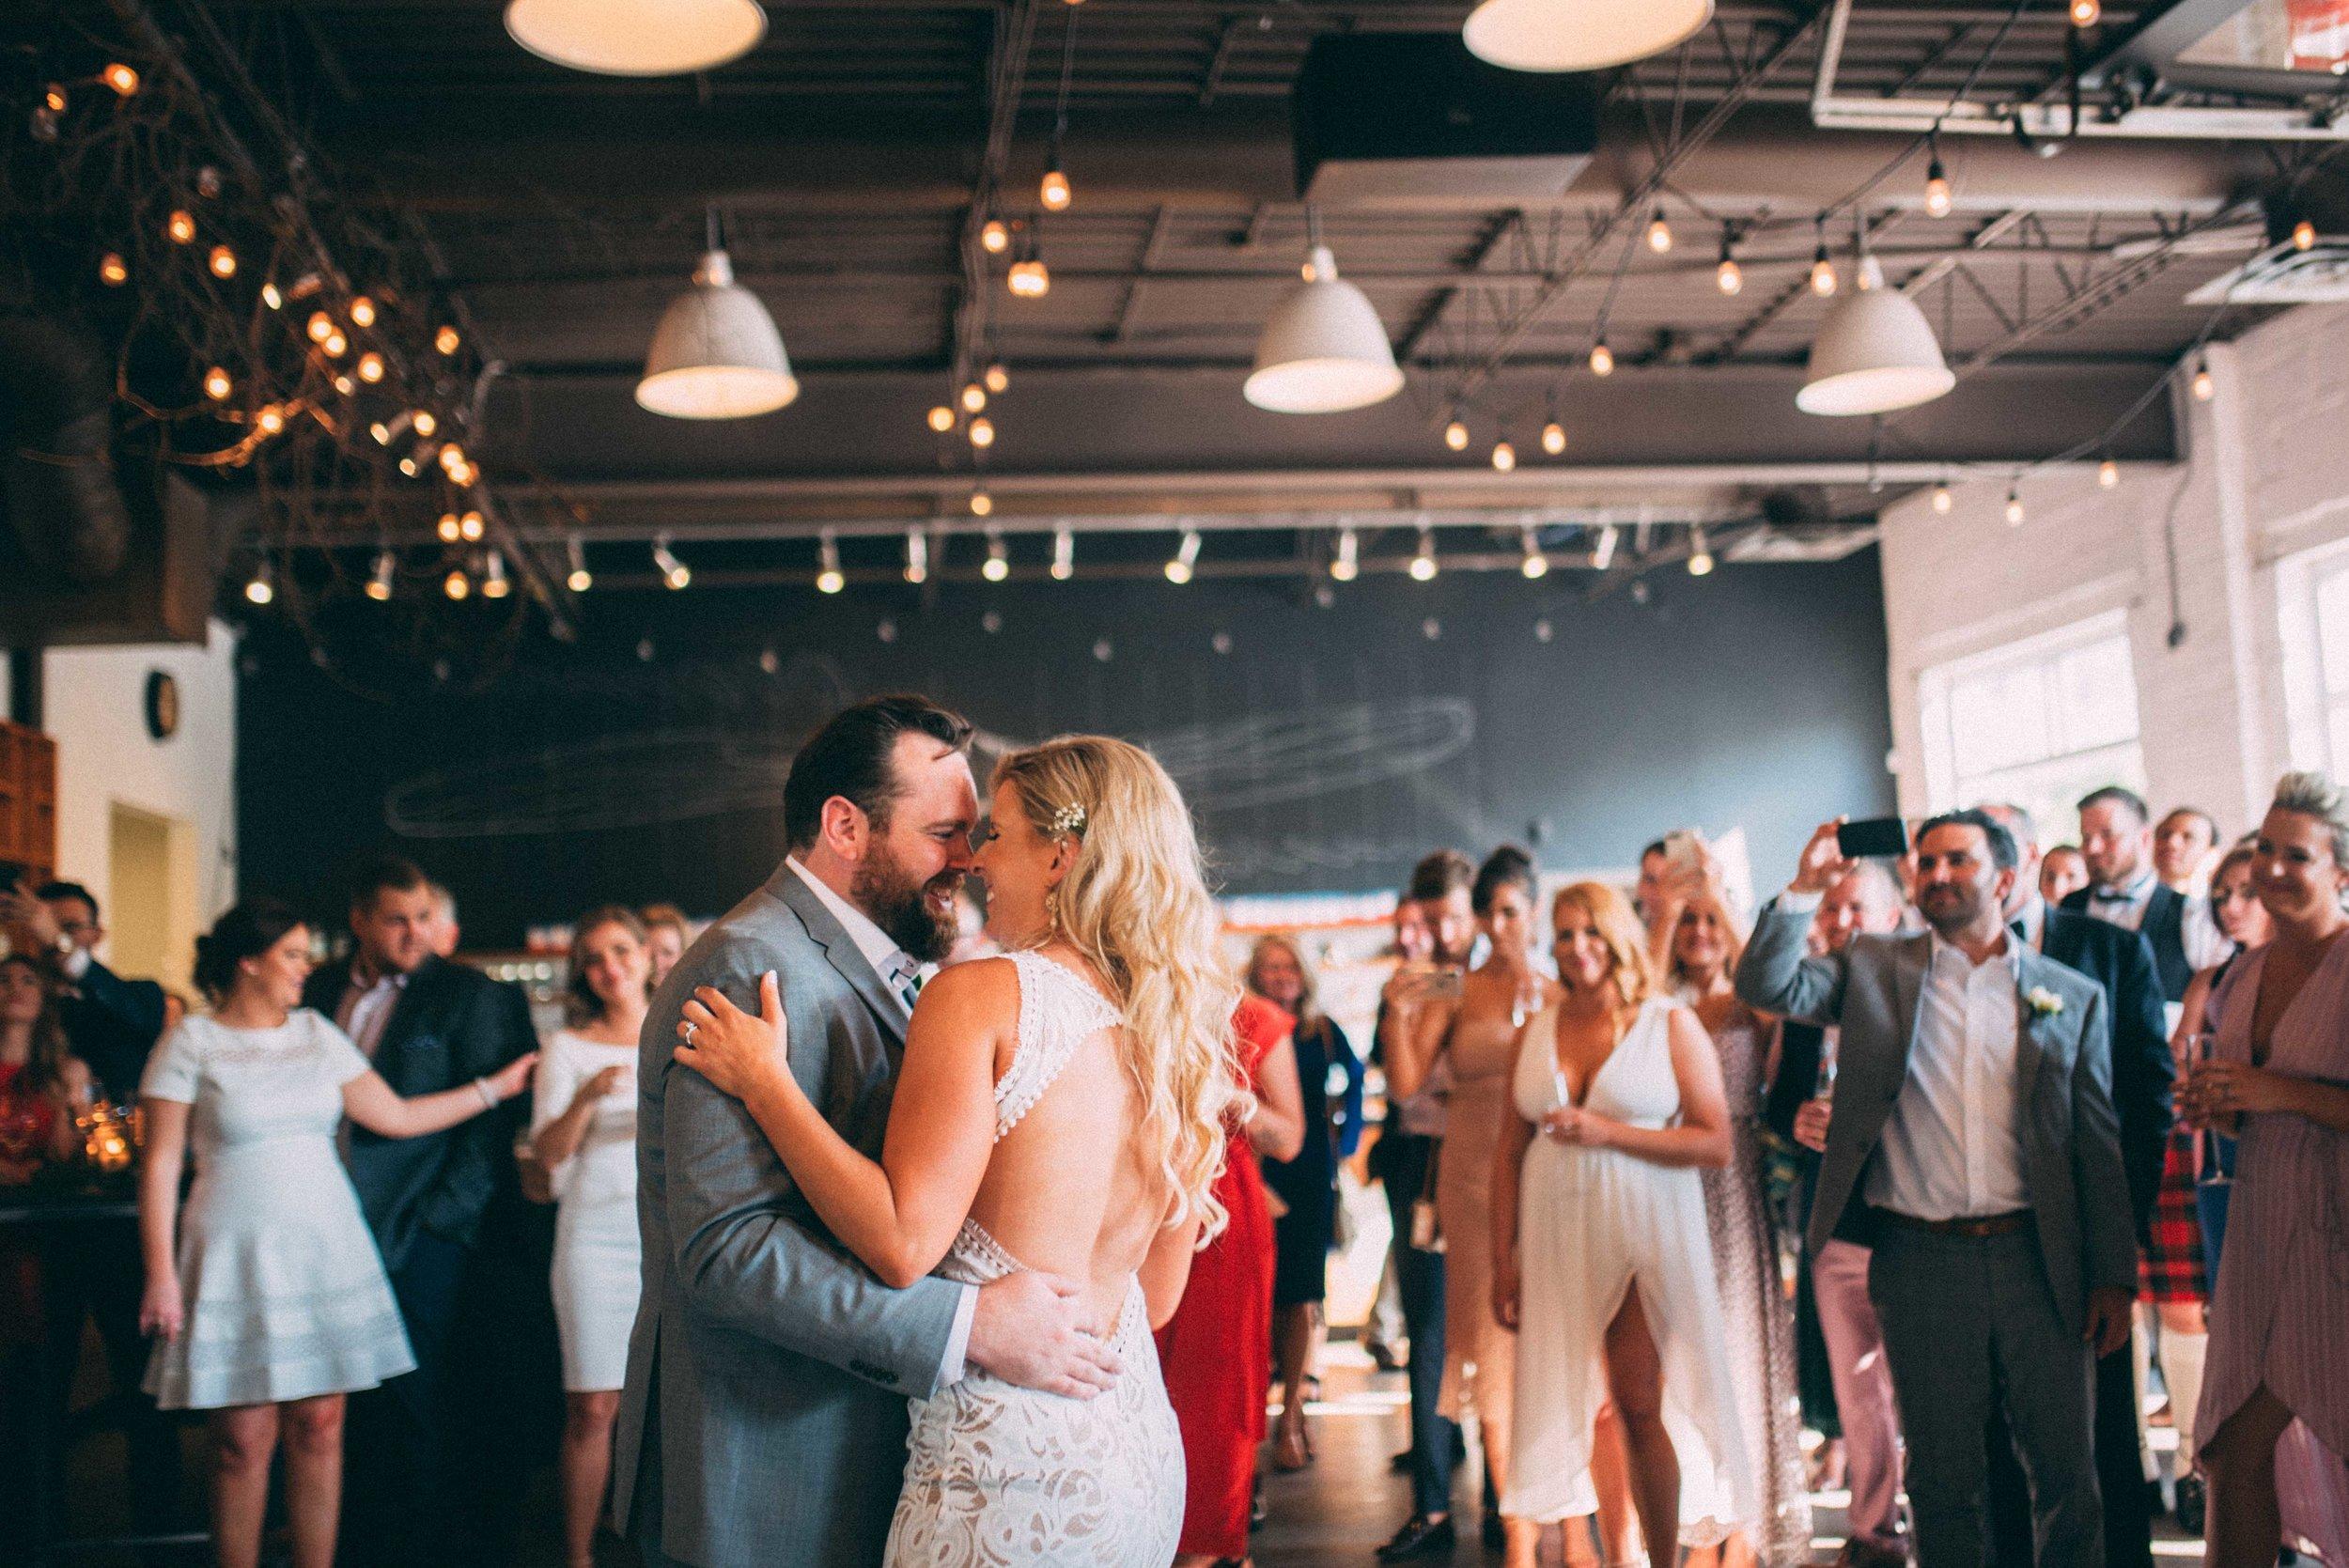 Toronto wedding photography with soundslikeyellowphotography, Propellor Coffee Co. wedding